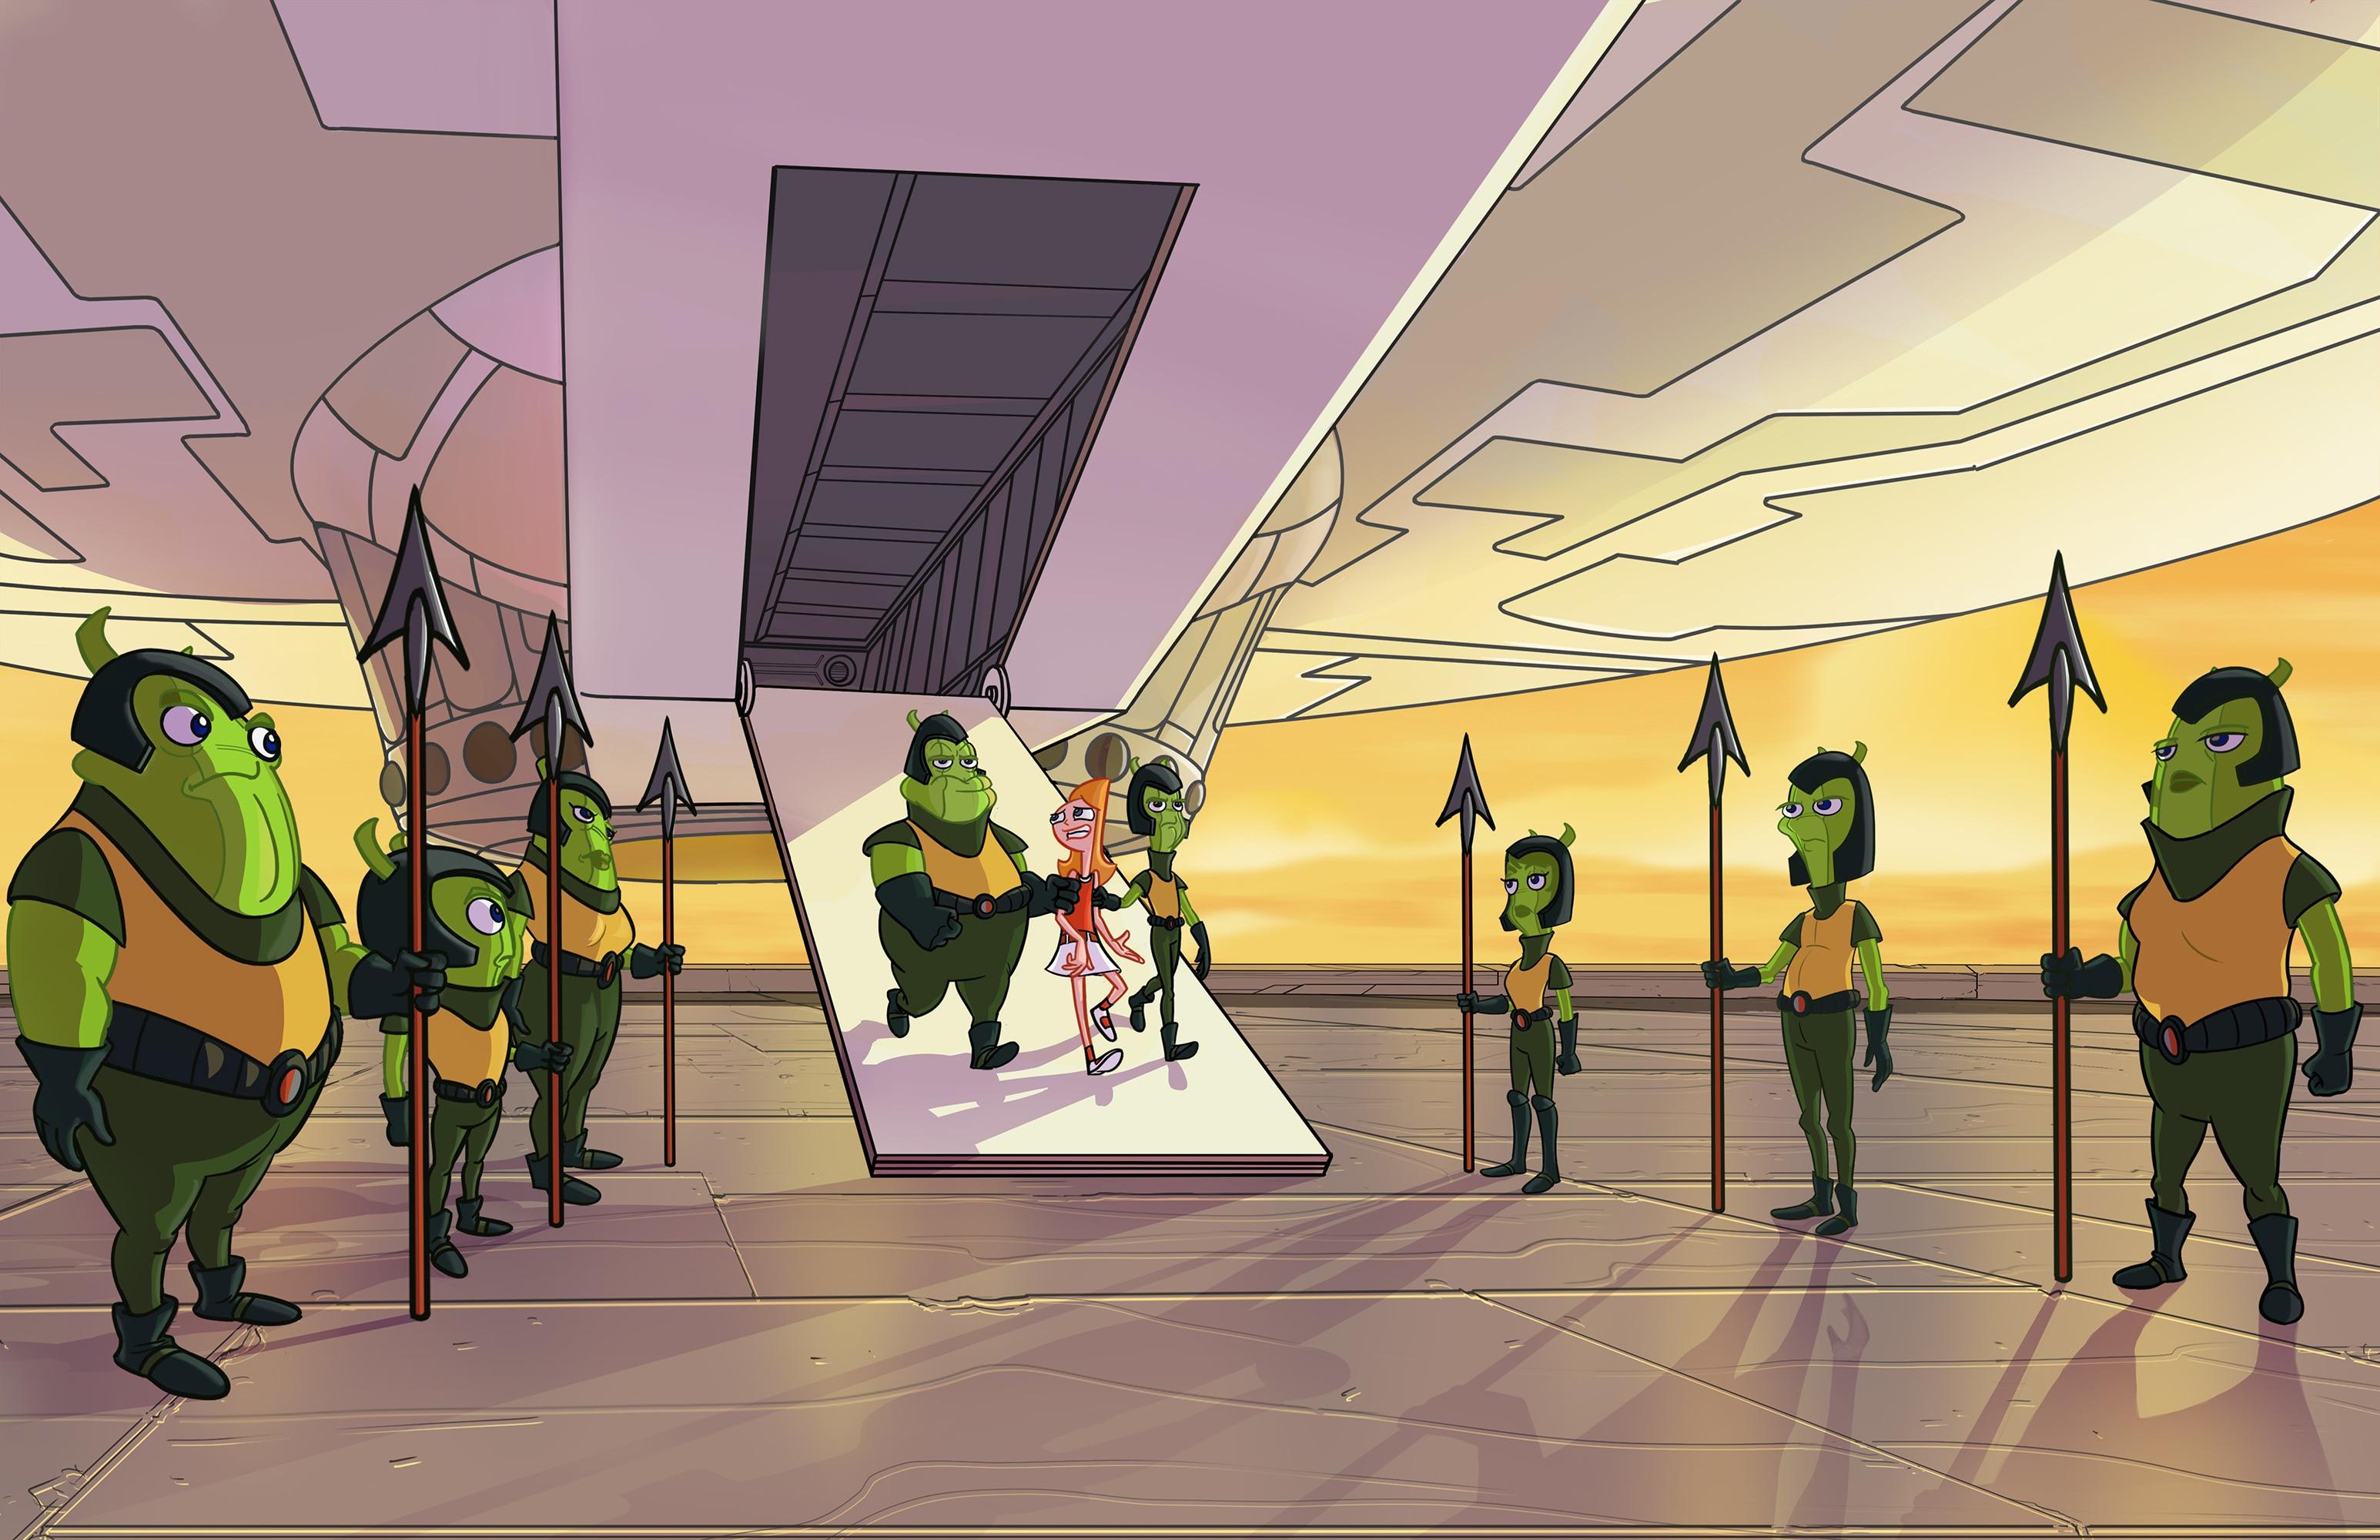 Unknown green aliens